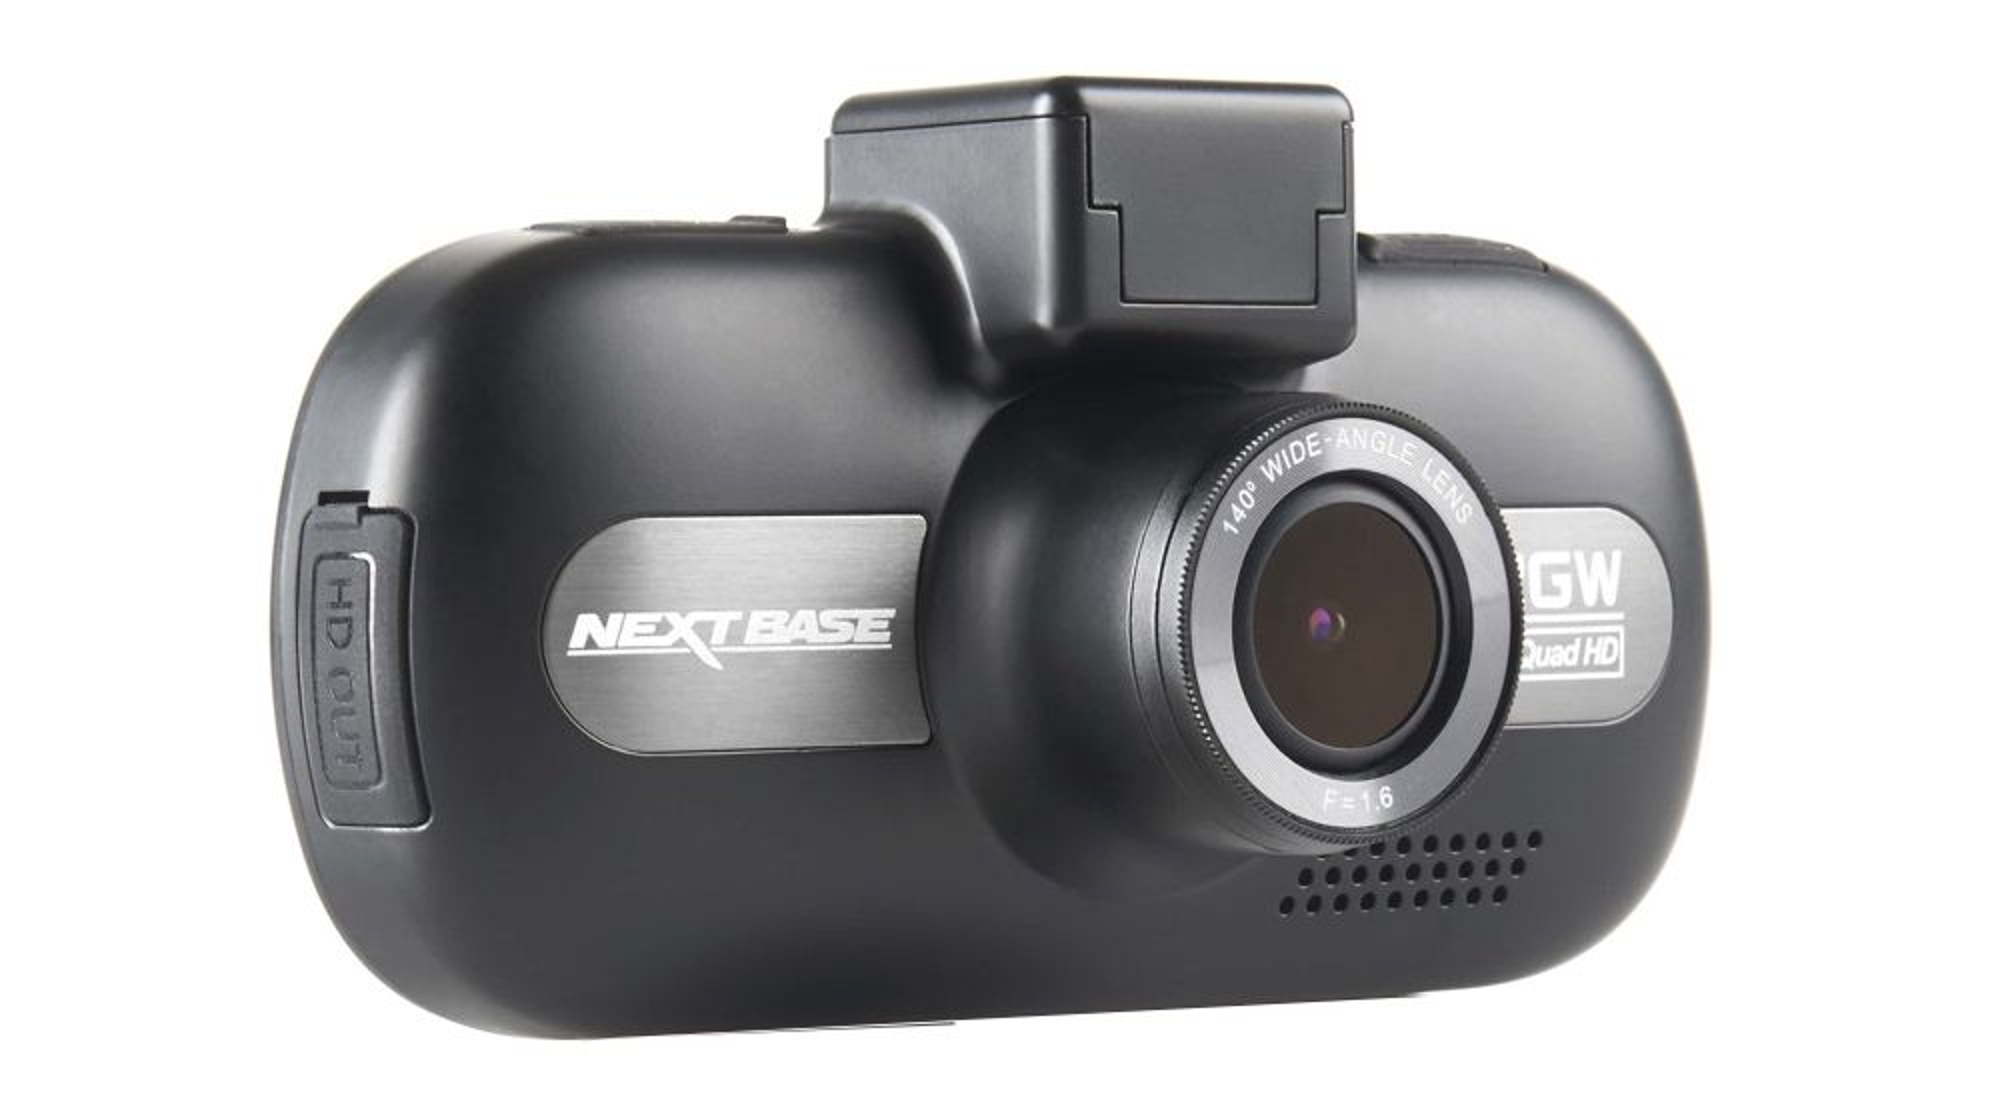 Dashboard-kamera: I dag kan du vinne den siste dashcam-modellen til NextBase (512GW).